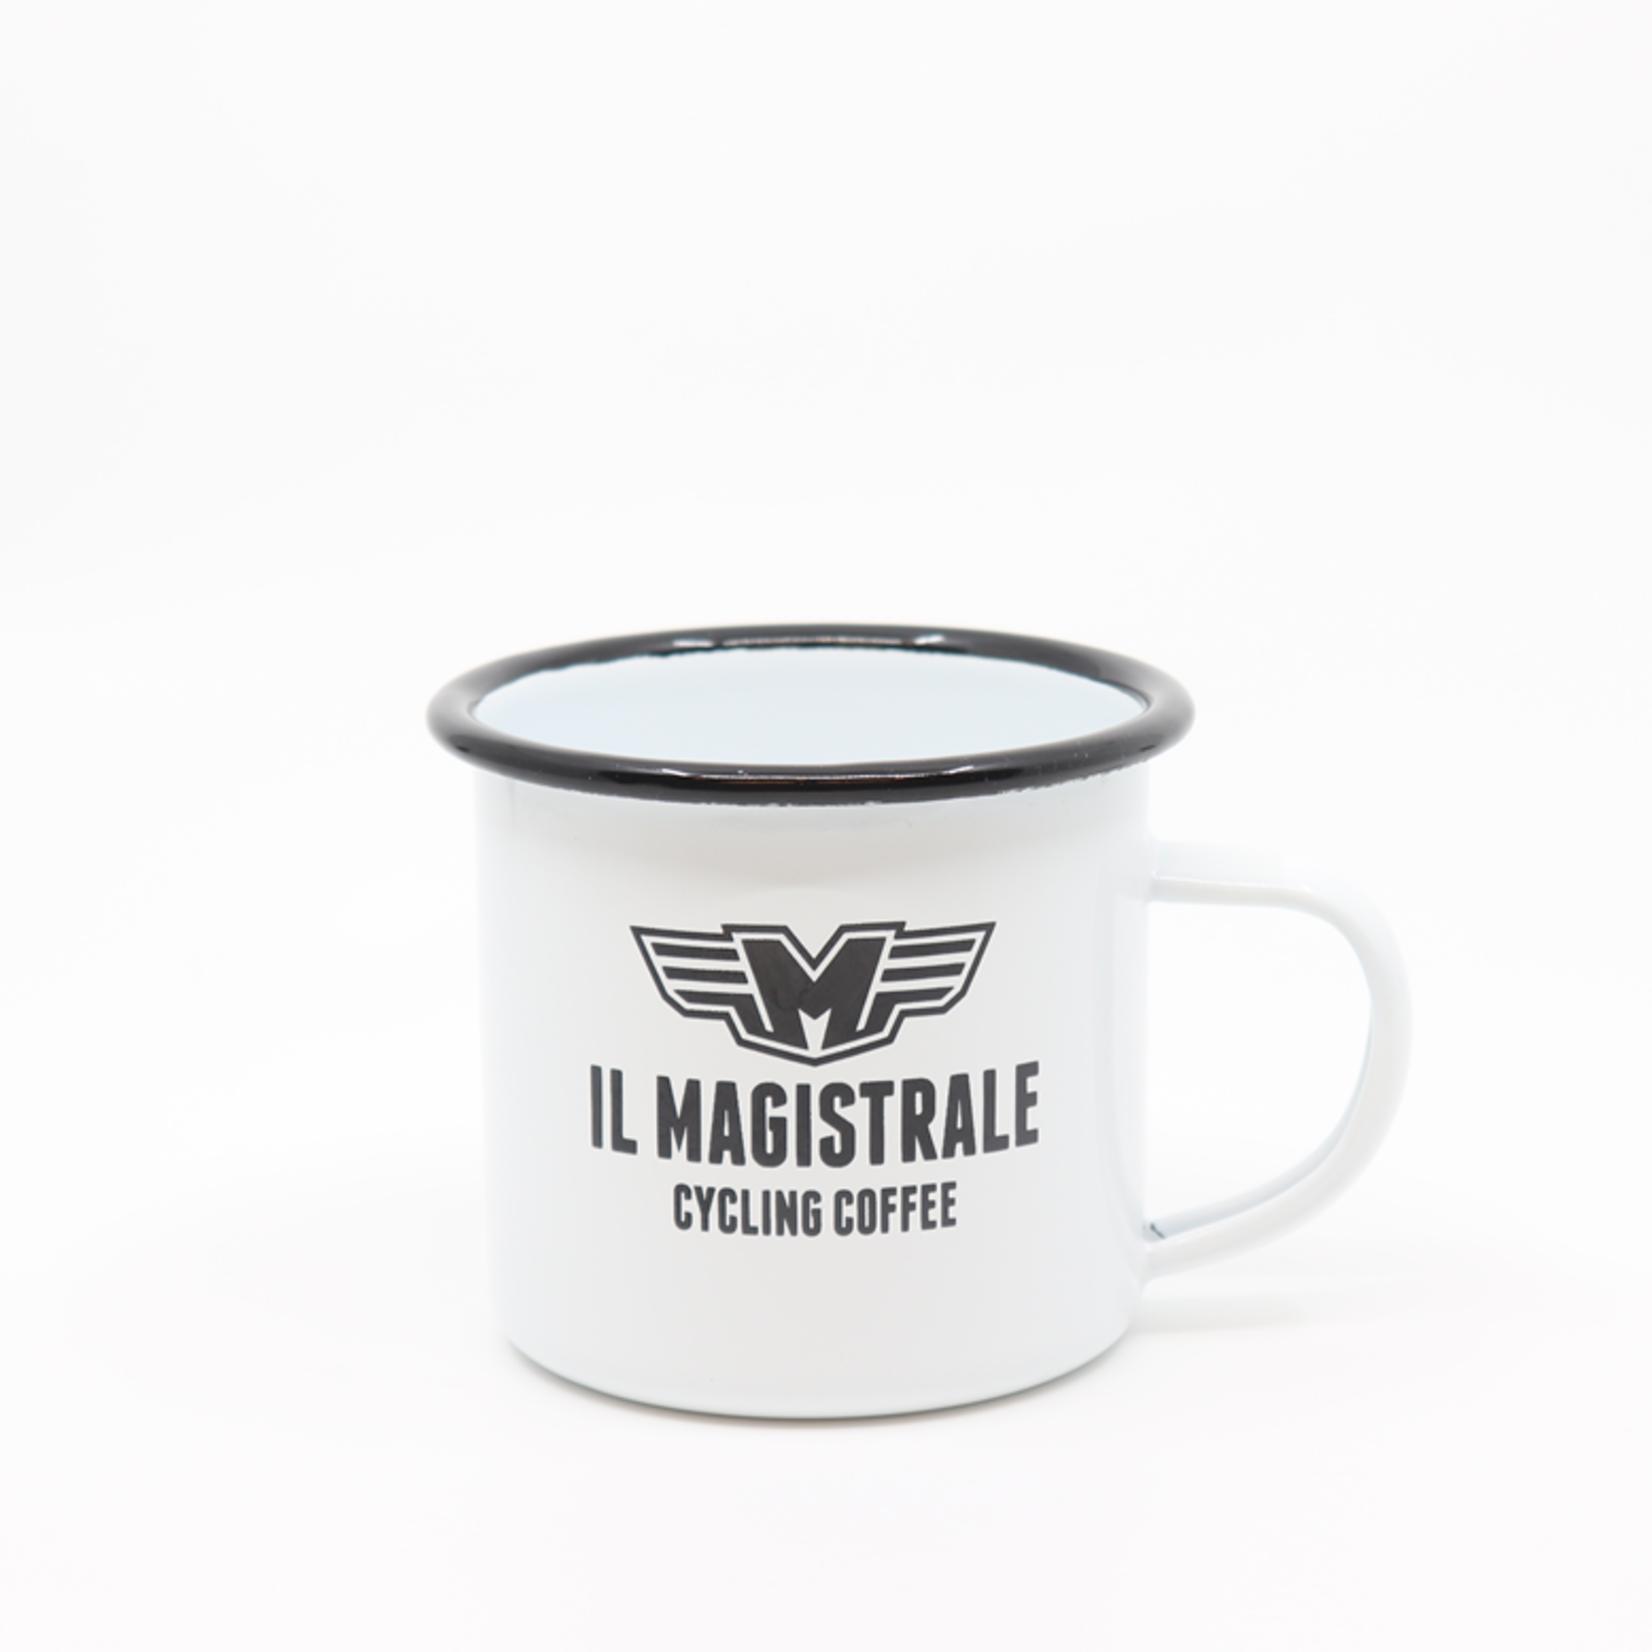 Gravel Mug (Emaille) Il magistrale